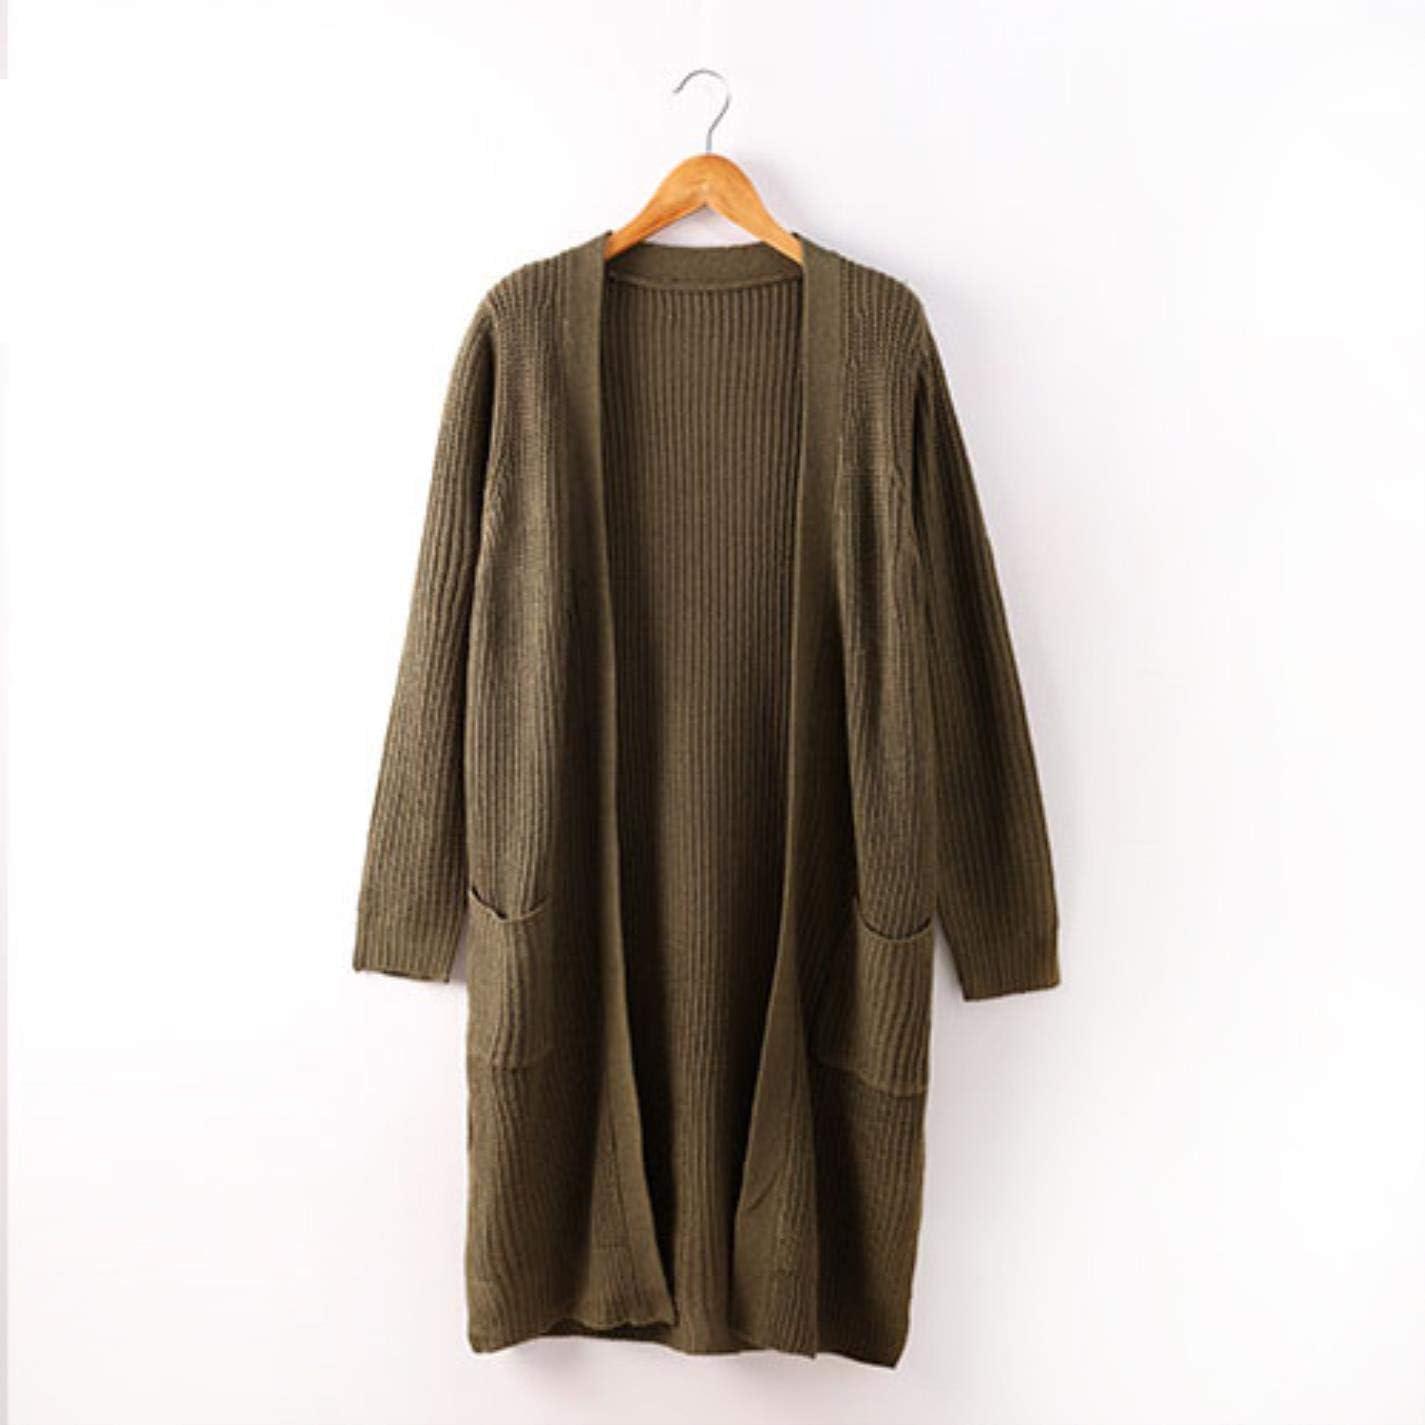 PjBWoEMP Womens Knit Cardigan Casual Long Sleeve Sweater